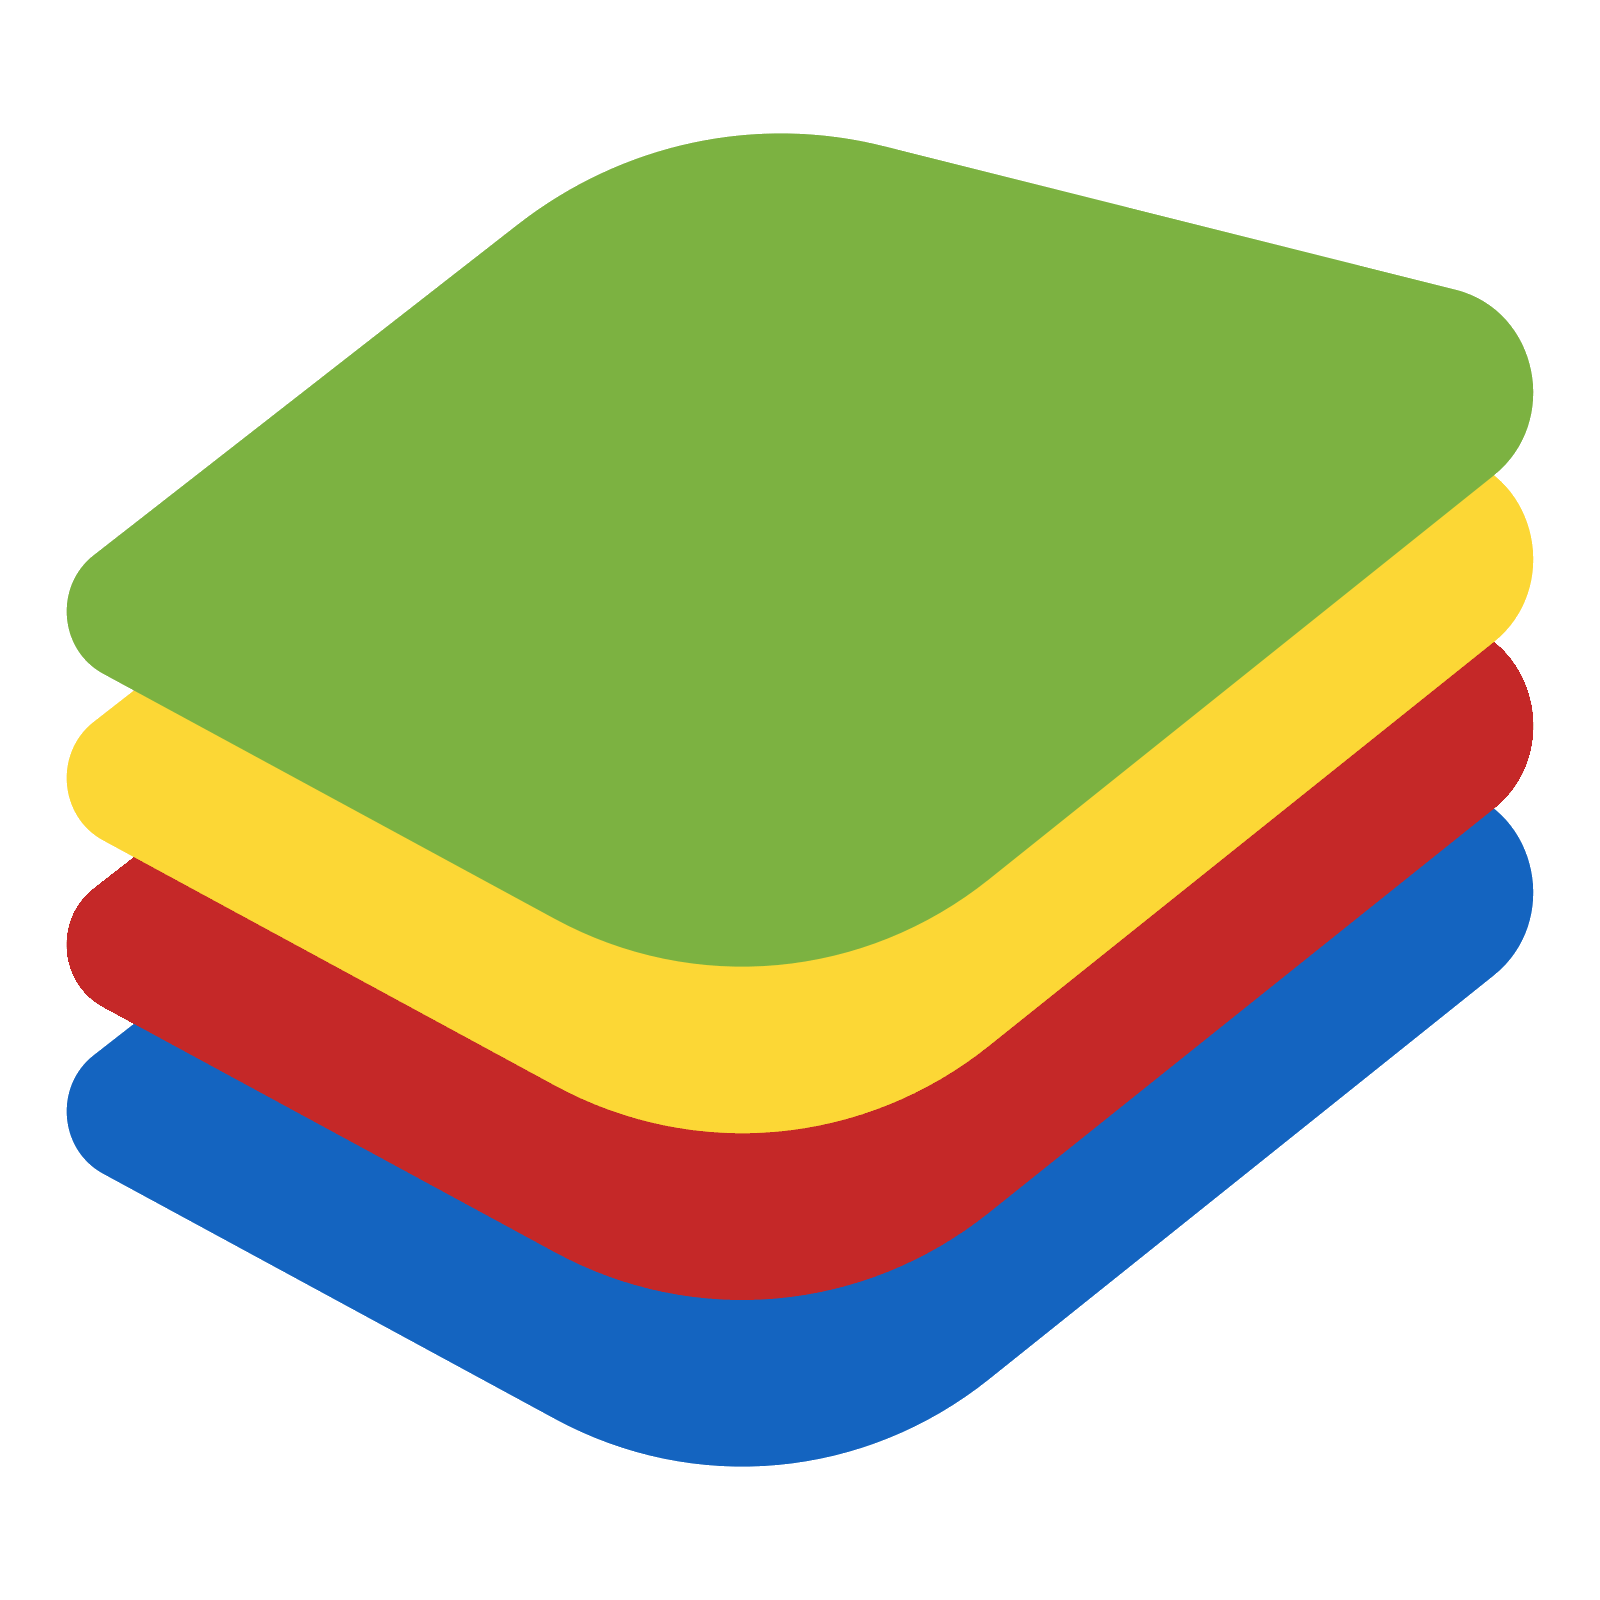 download bluestacks windows 7 32 bit full